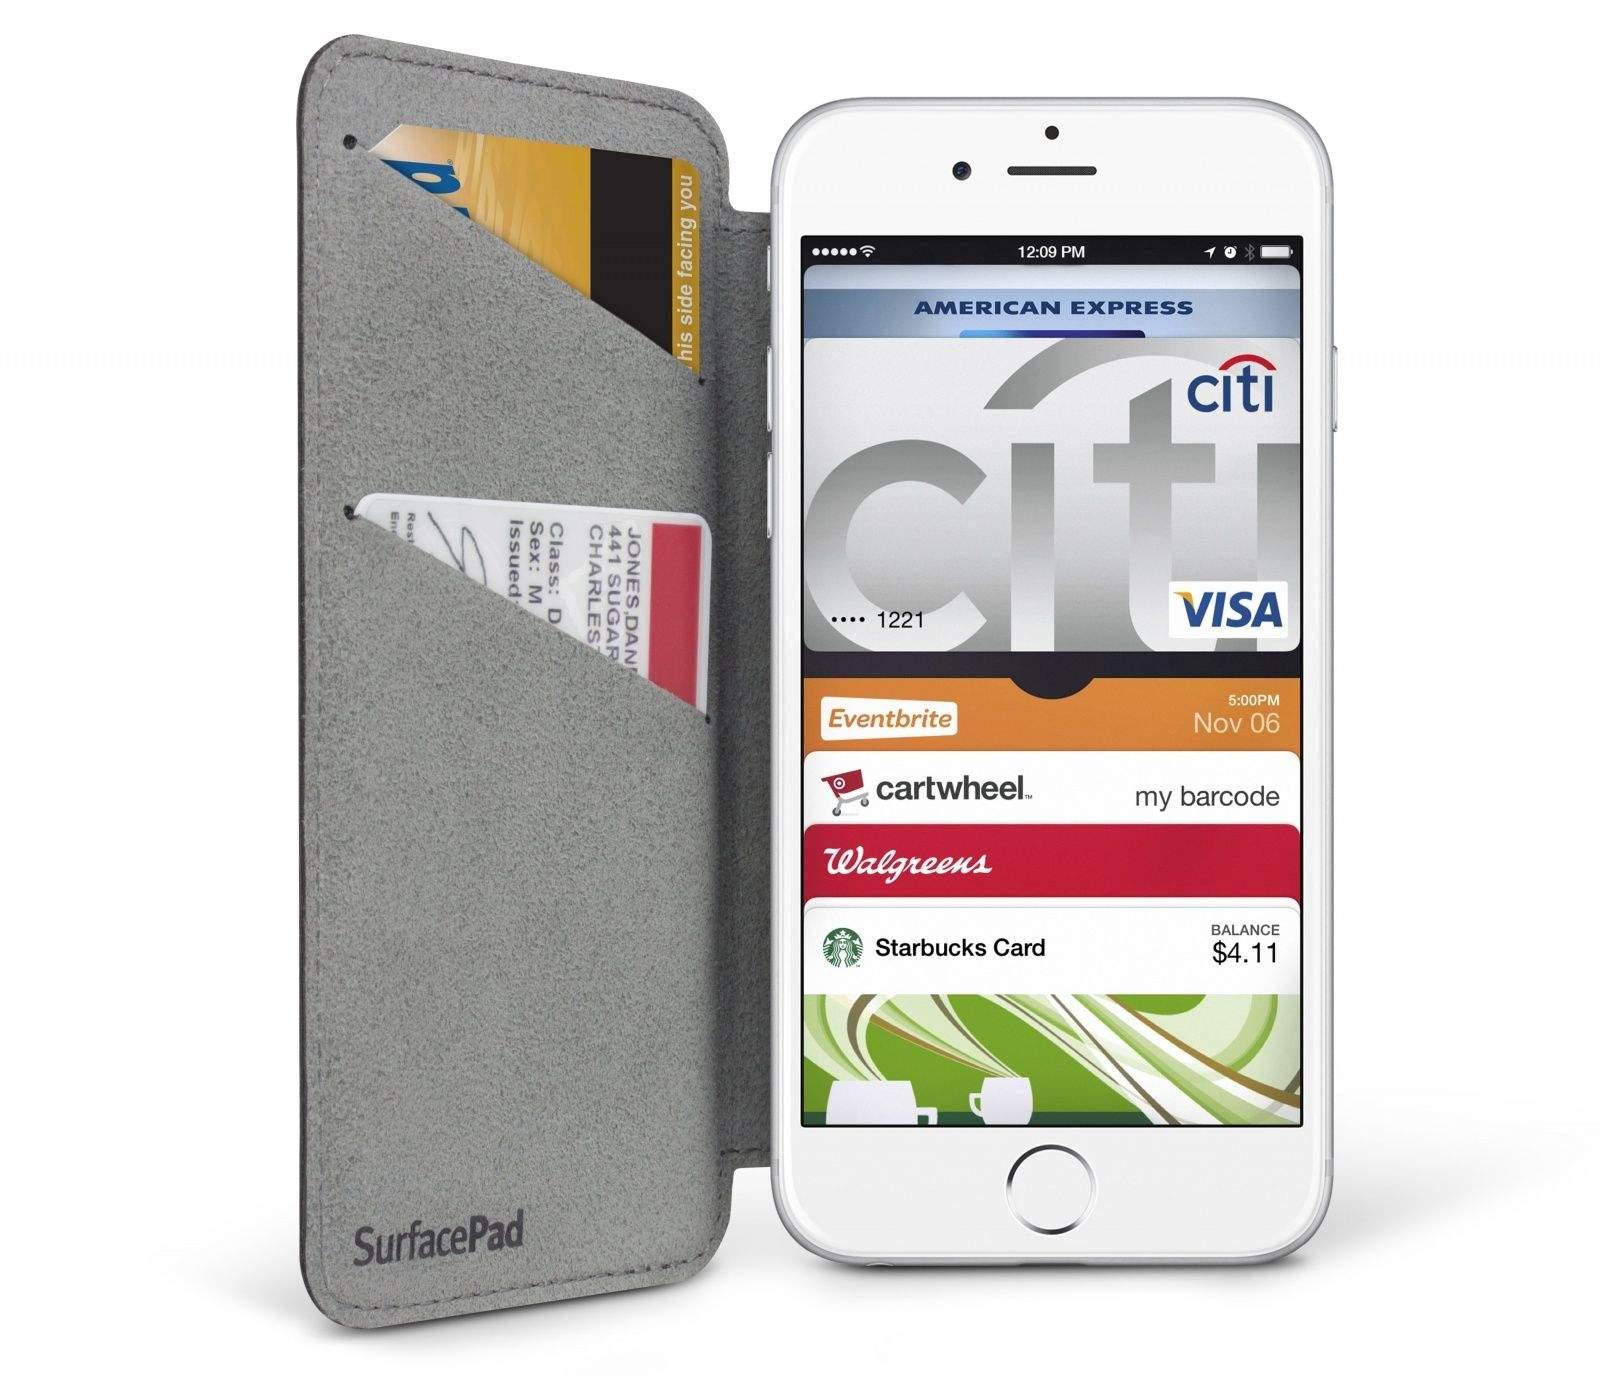 iphone 6 wrap around case